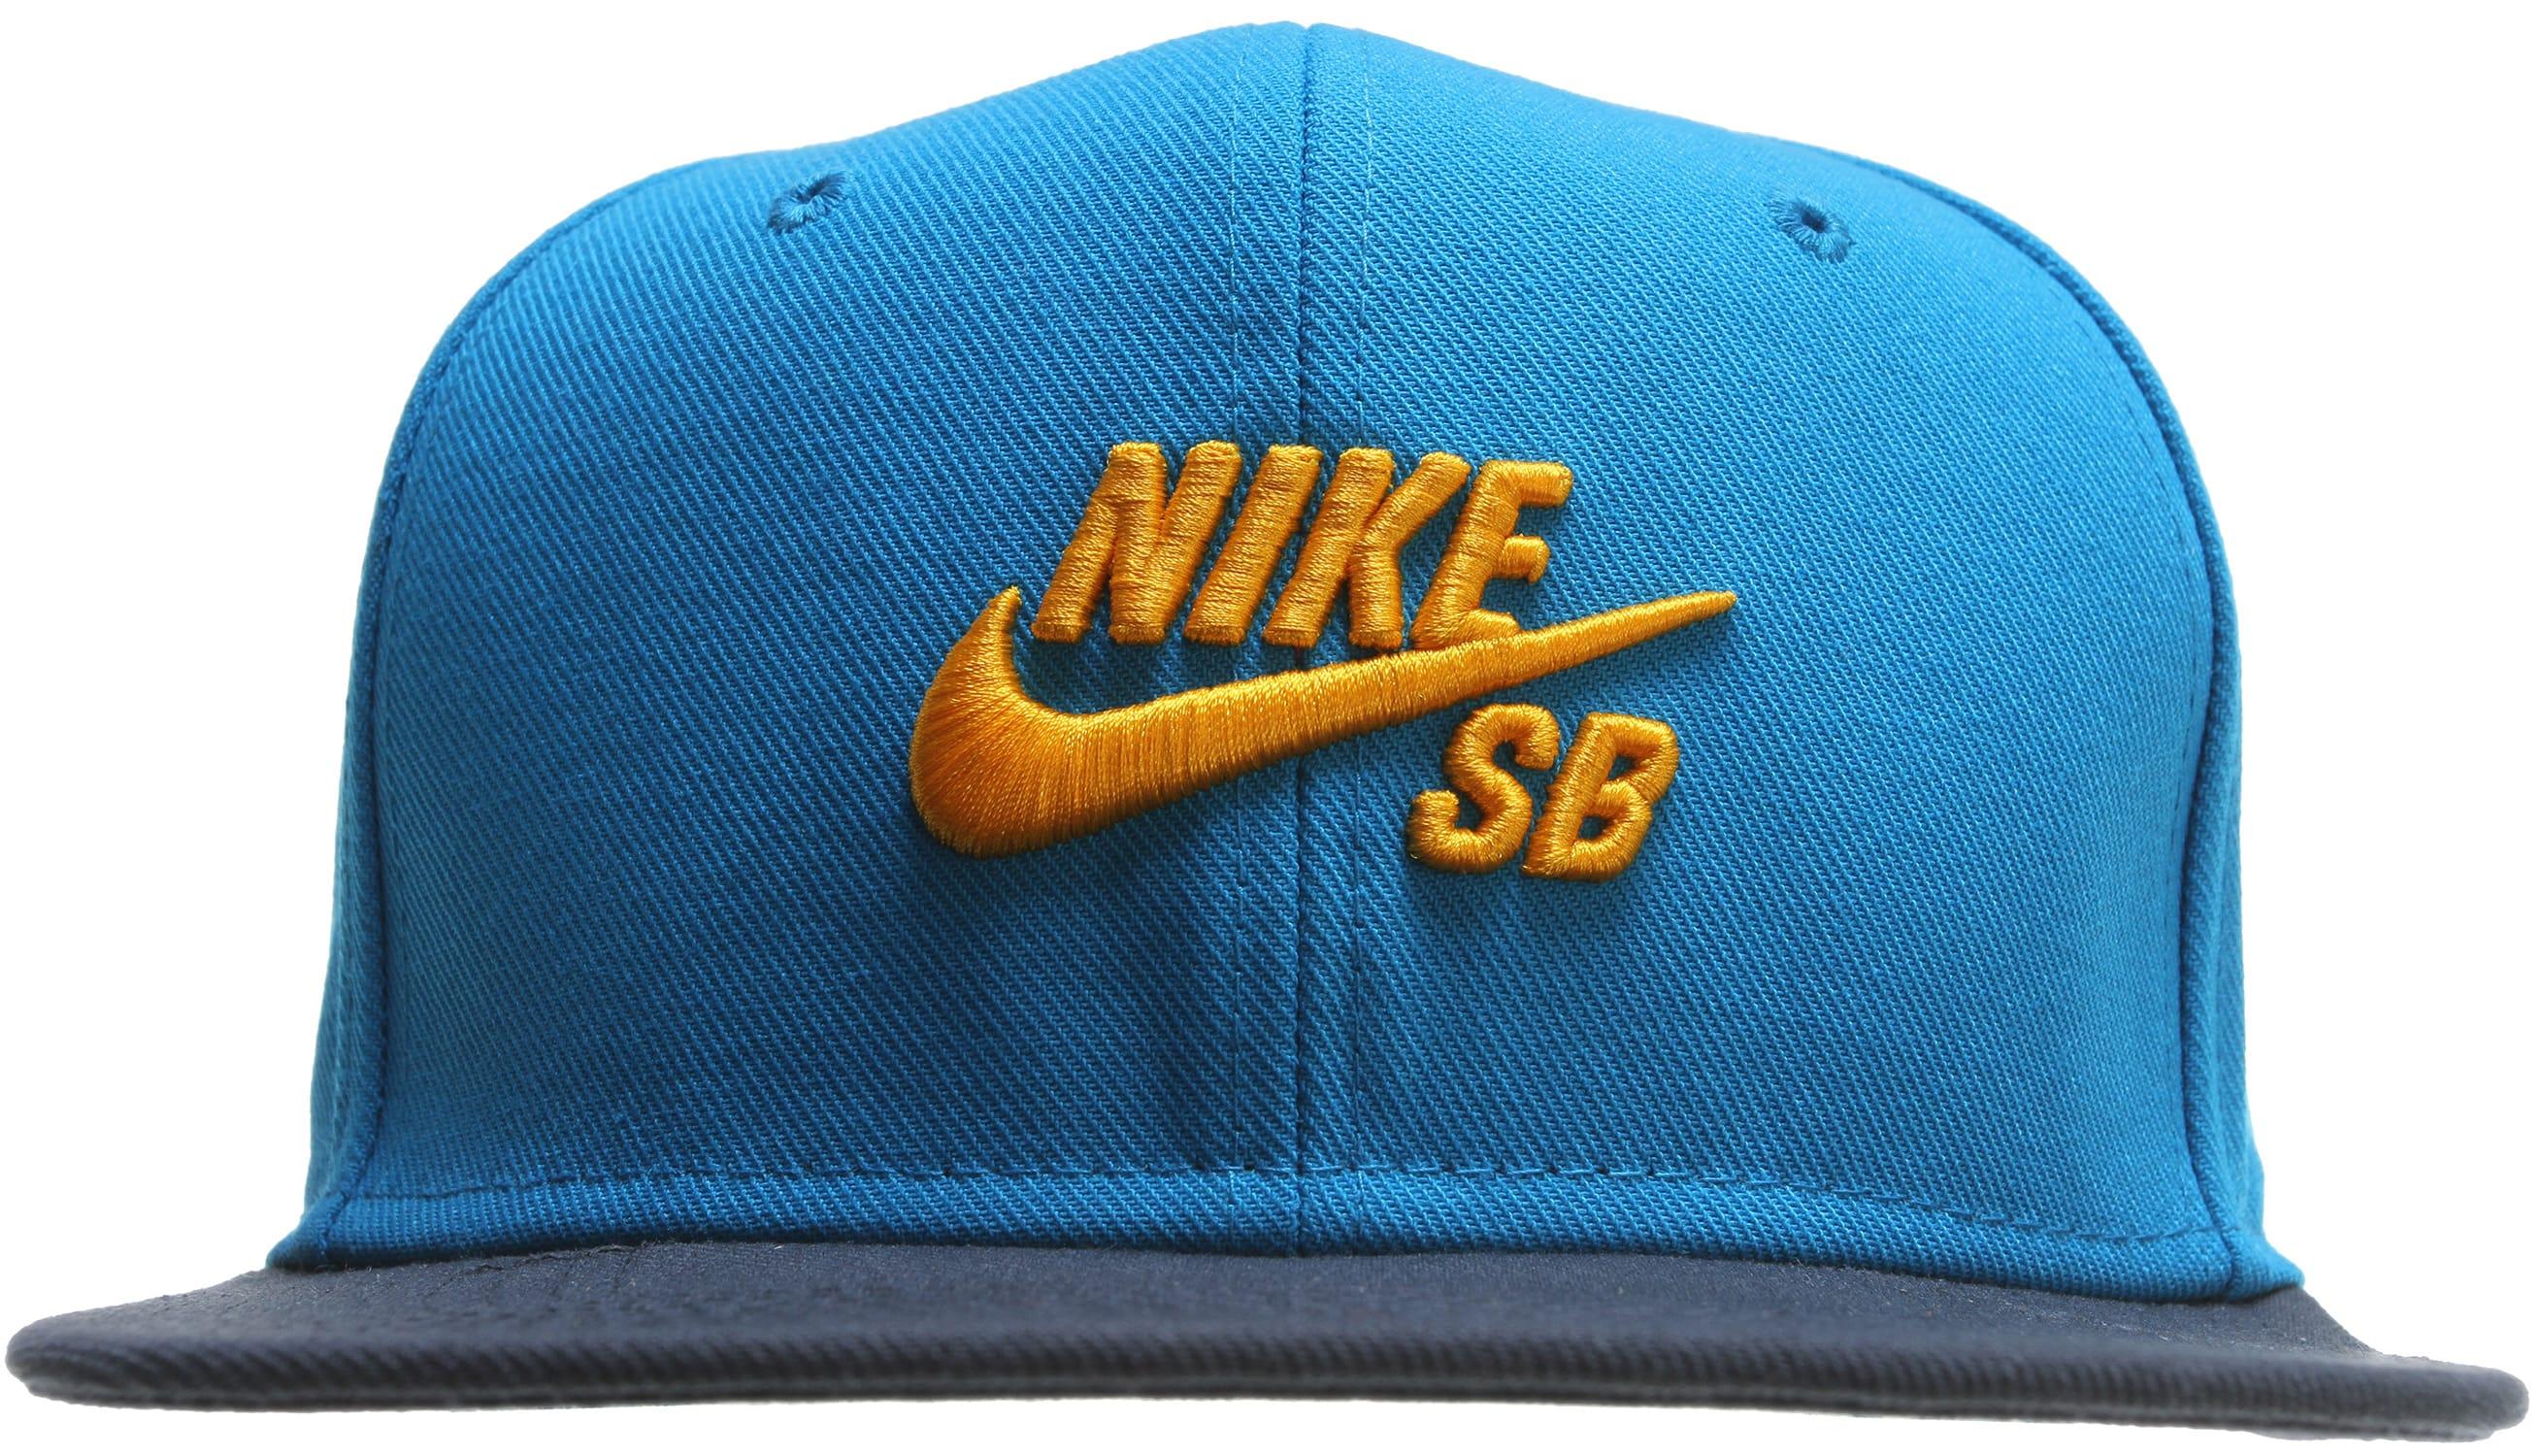 94f0f05963d Tag Nike Snapback Caps Philippines — waldon.protese-de-silicone.info